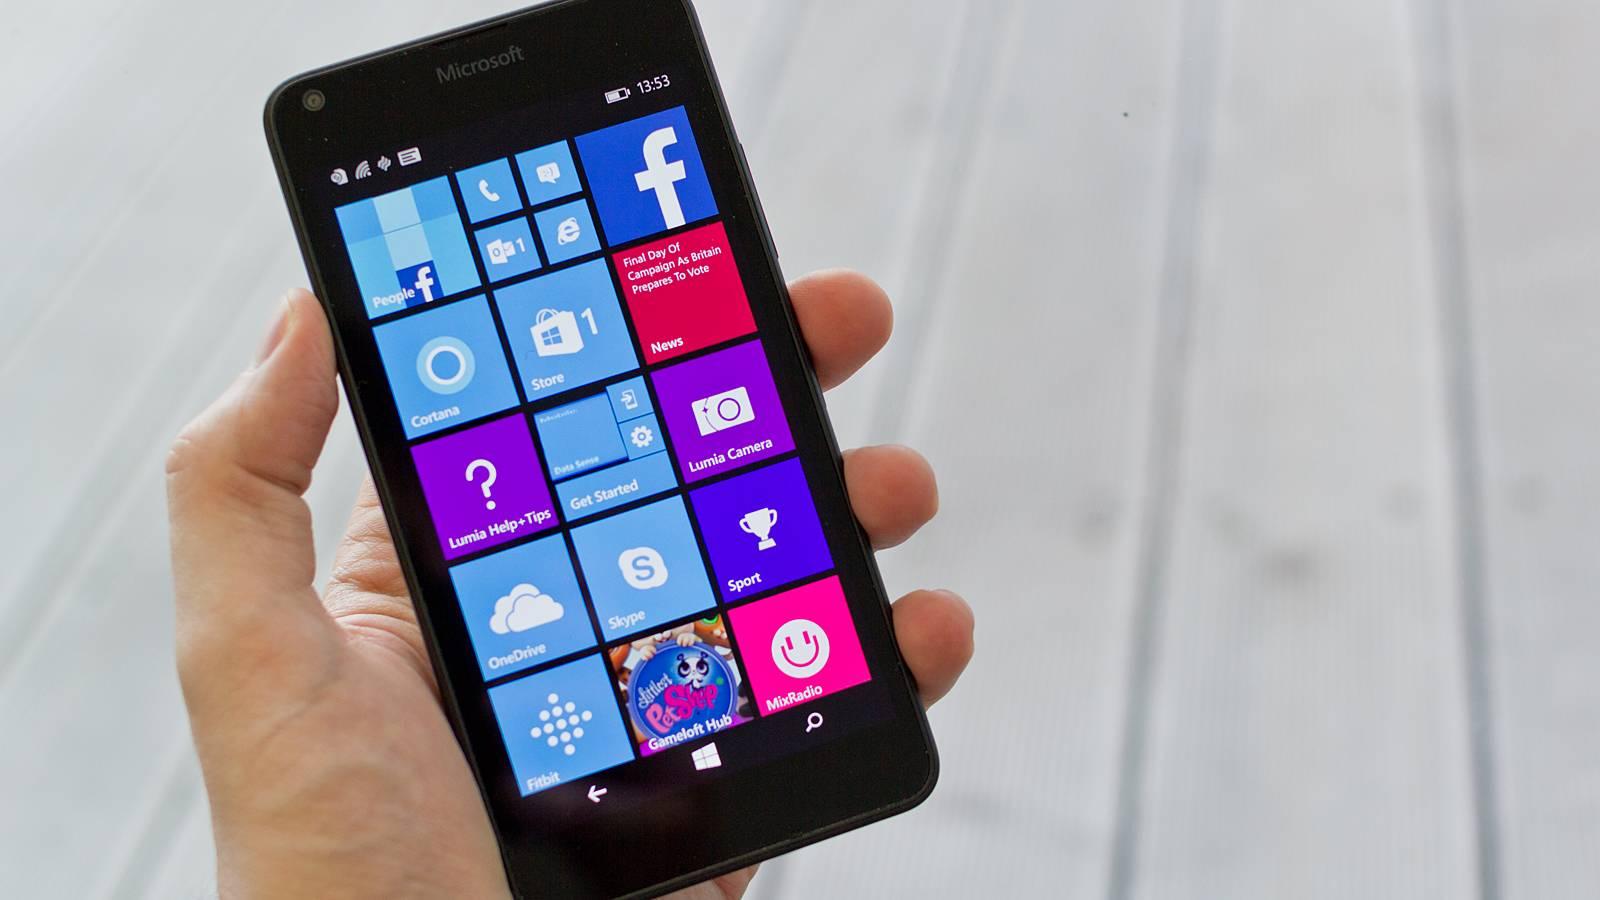 Скачать тик ток на телефон android, iphone или windows mobile